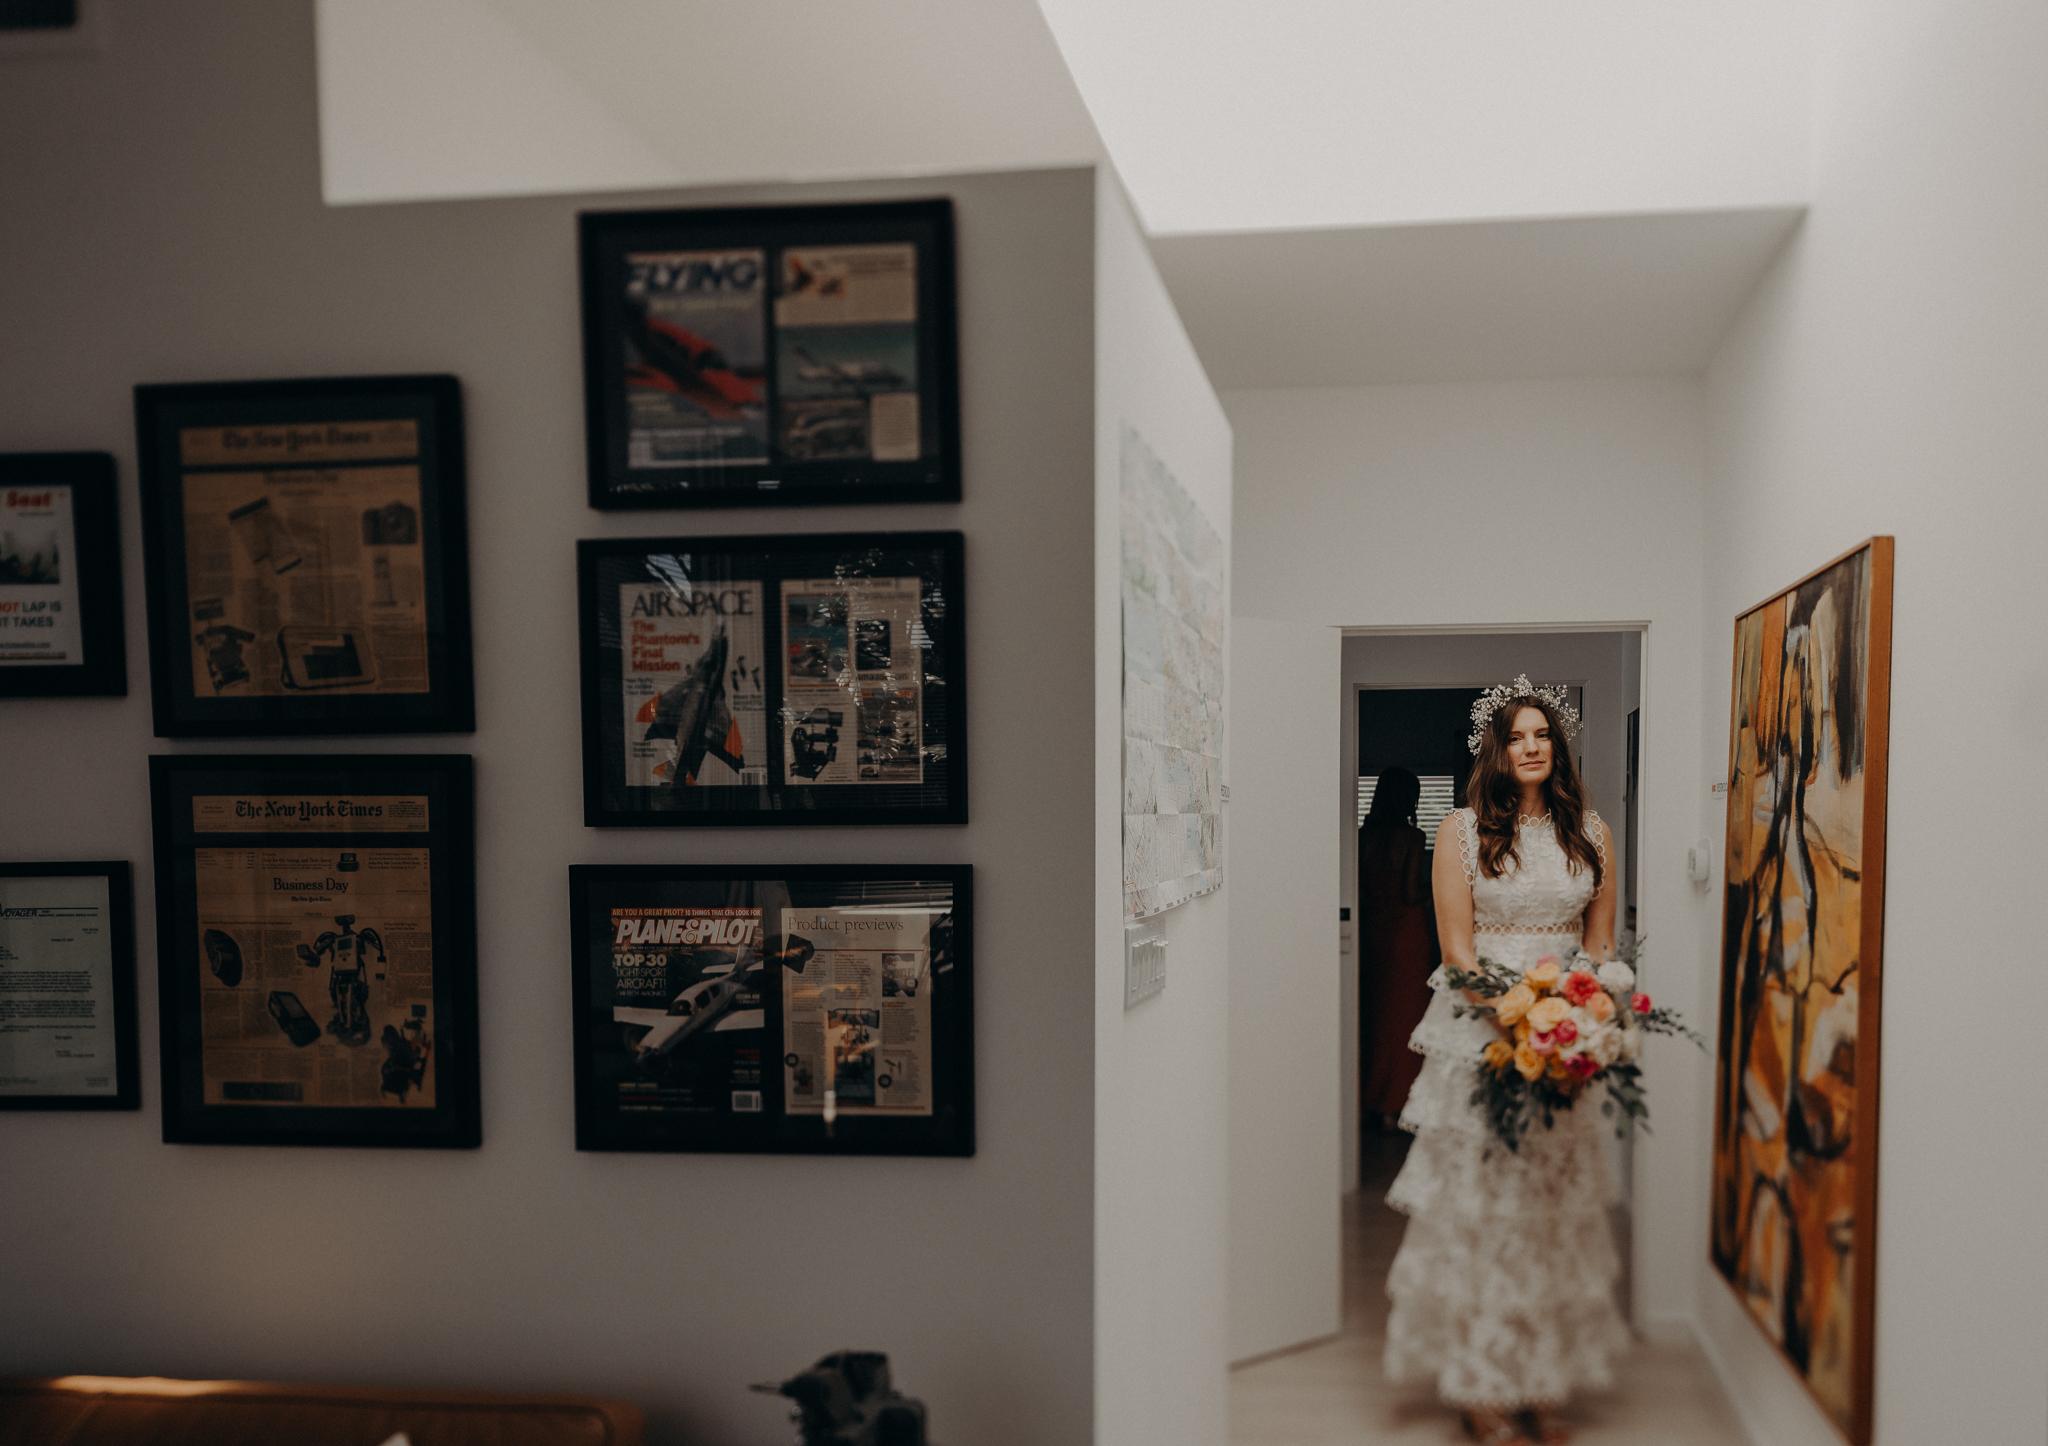 Isaiah + Taylor Photography - Private Estate Backyard Wedding - Beverly Hills - Los Angeles Wedding Photographer - 08.jpg